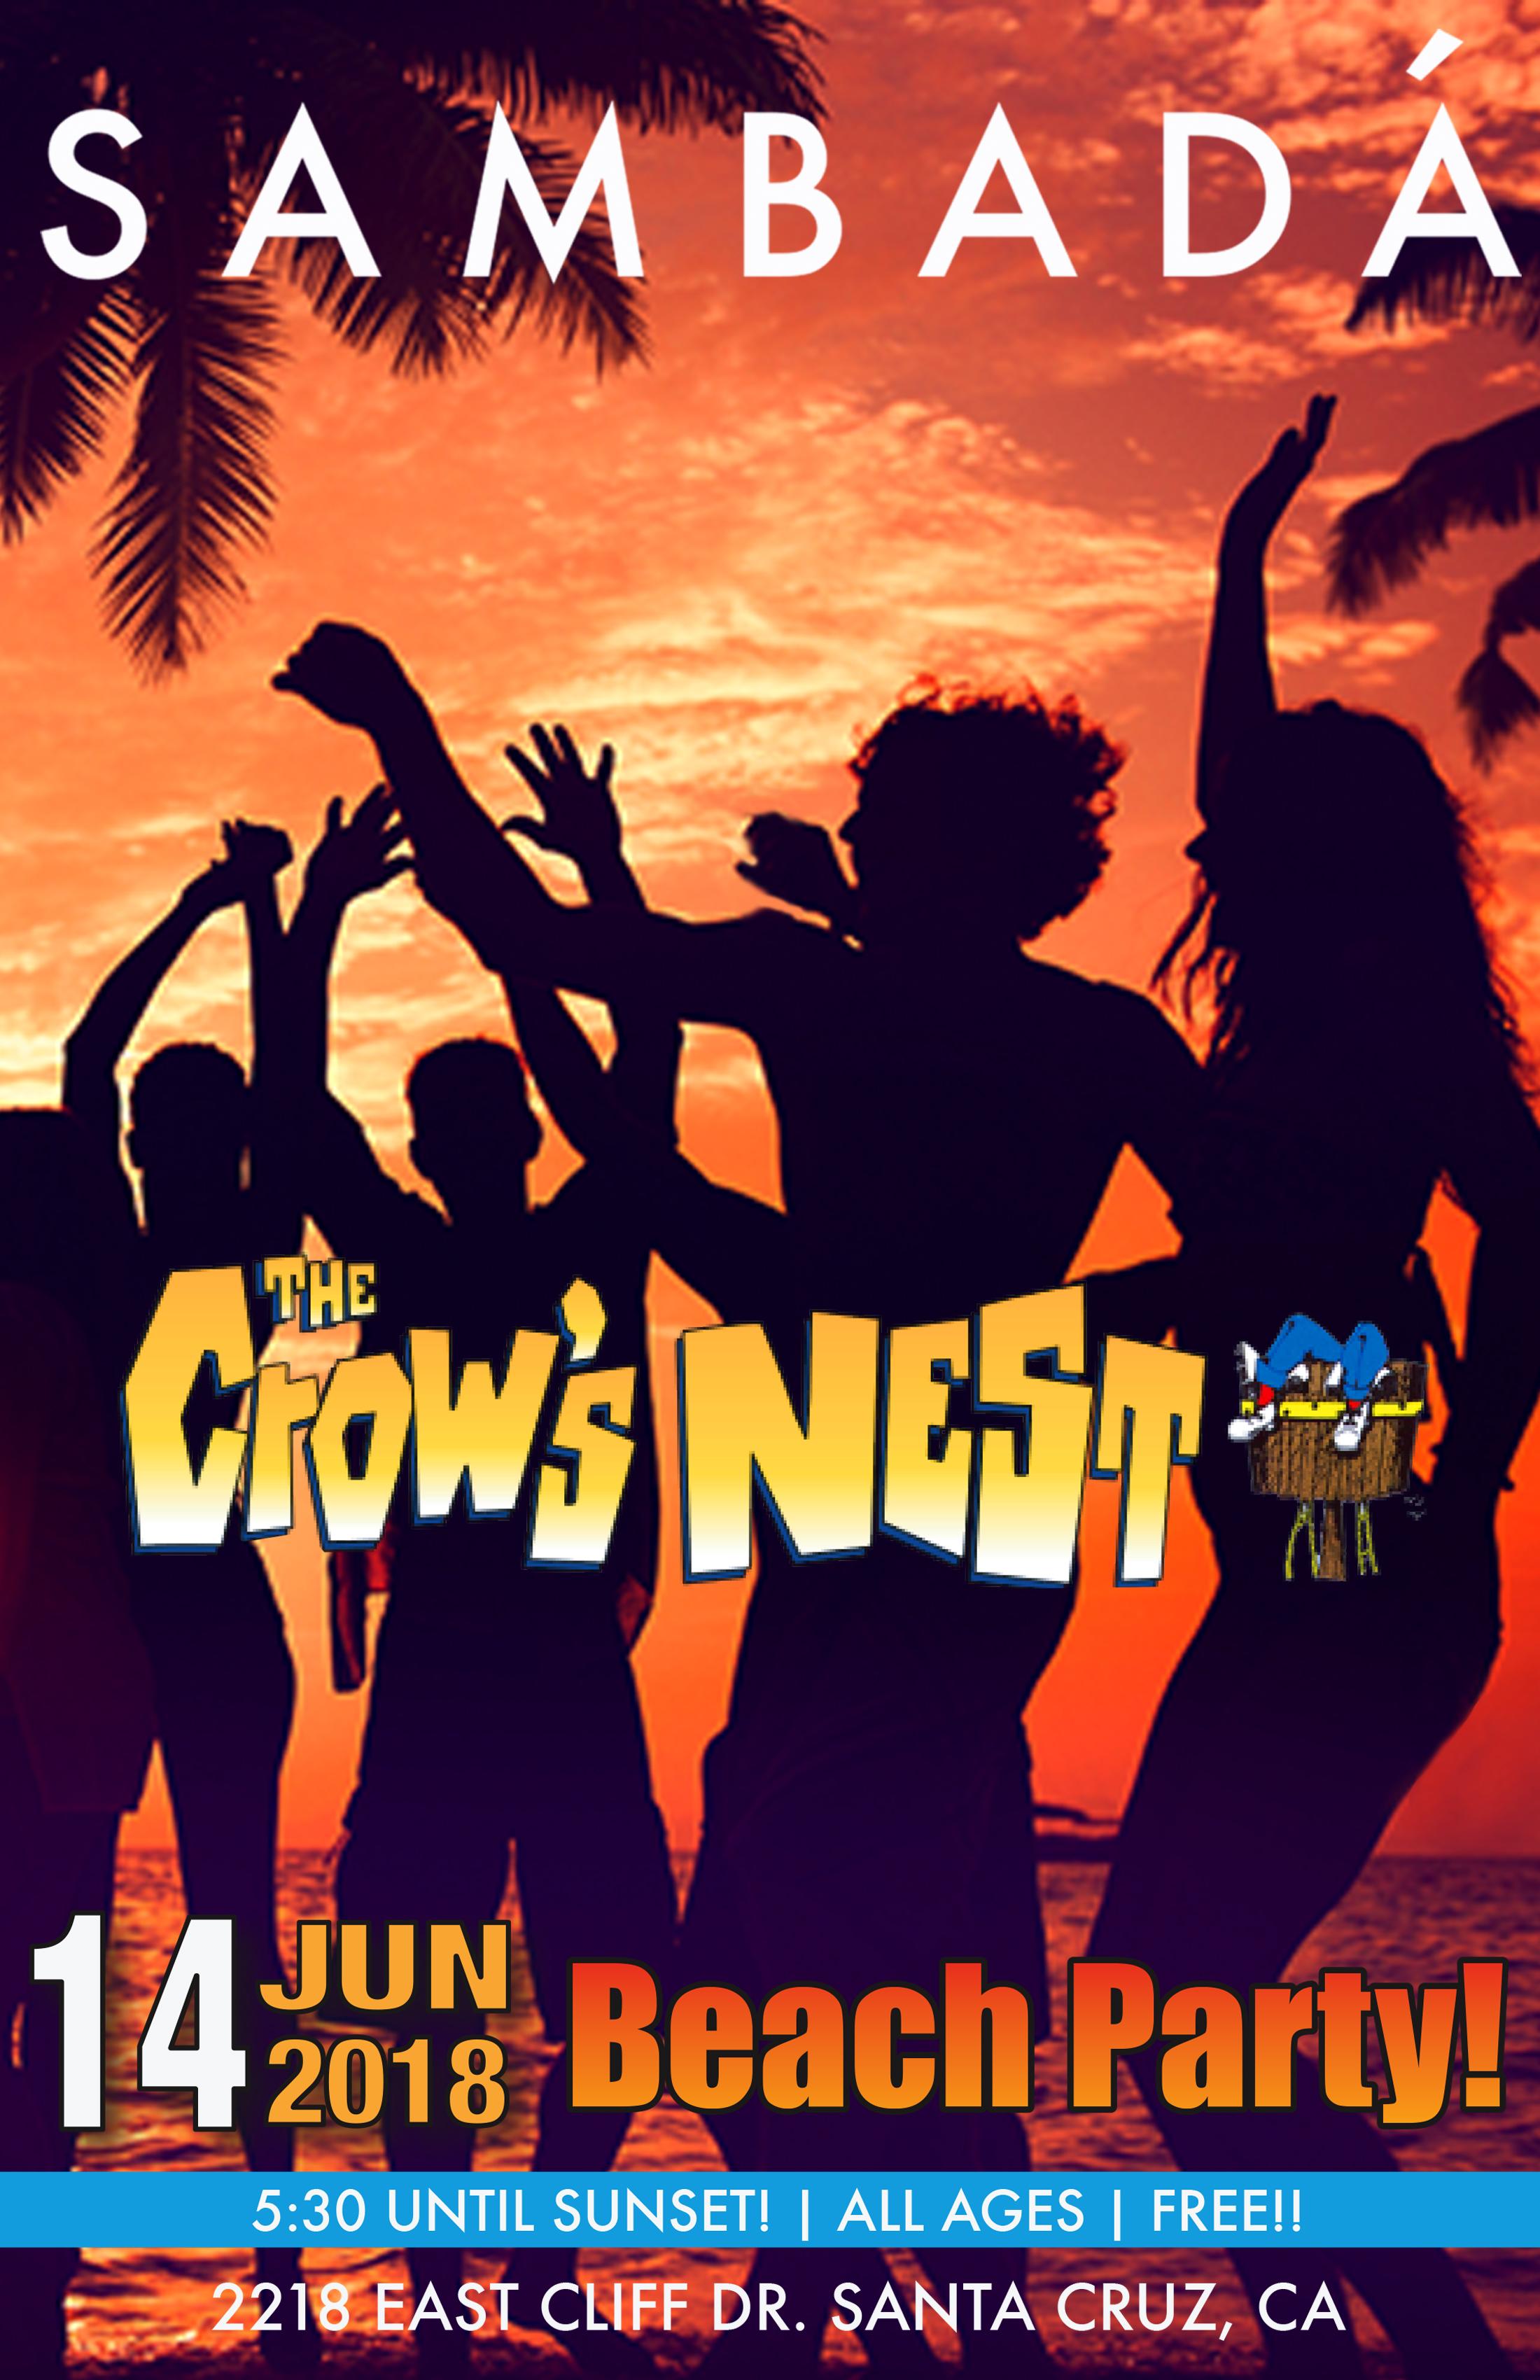 THURS.JUN.14 – CROW'S NEST BEACH PARTY – SANTA CRUZ, CA